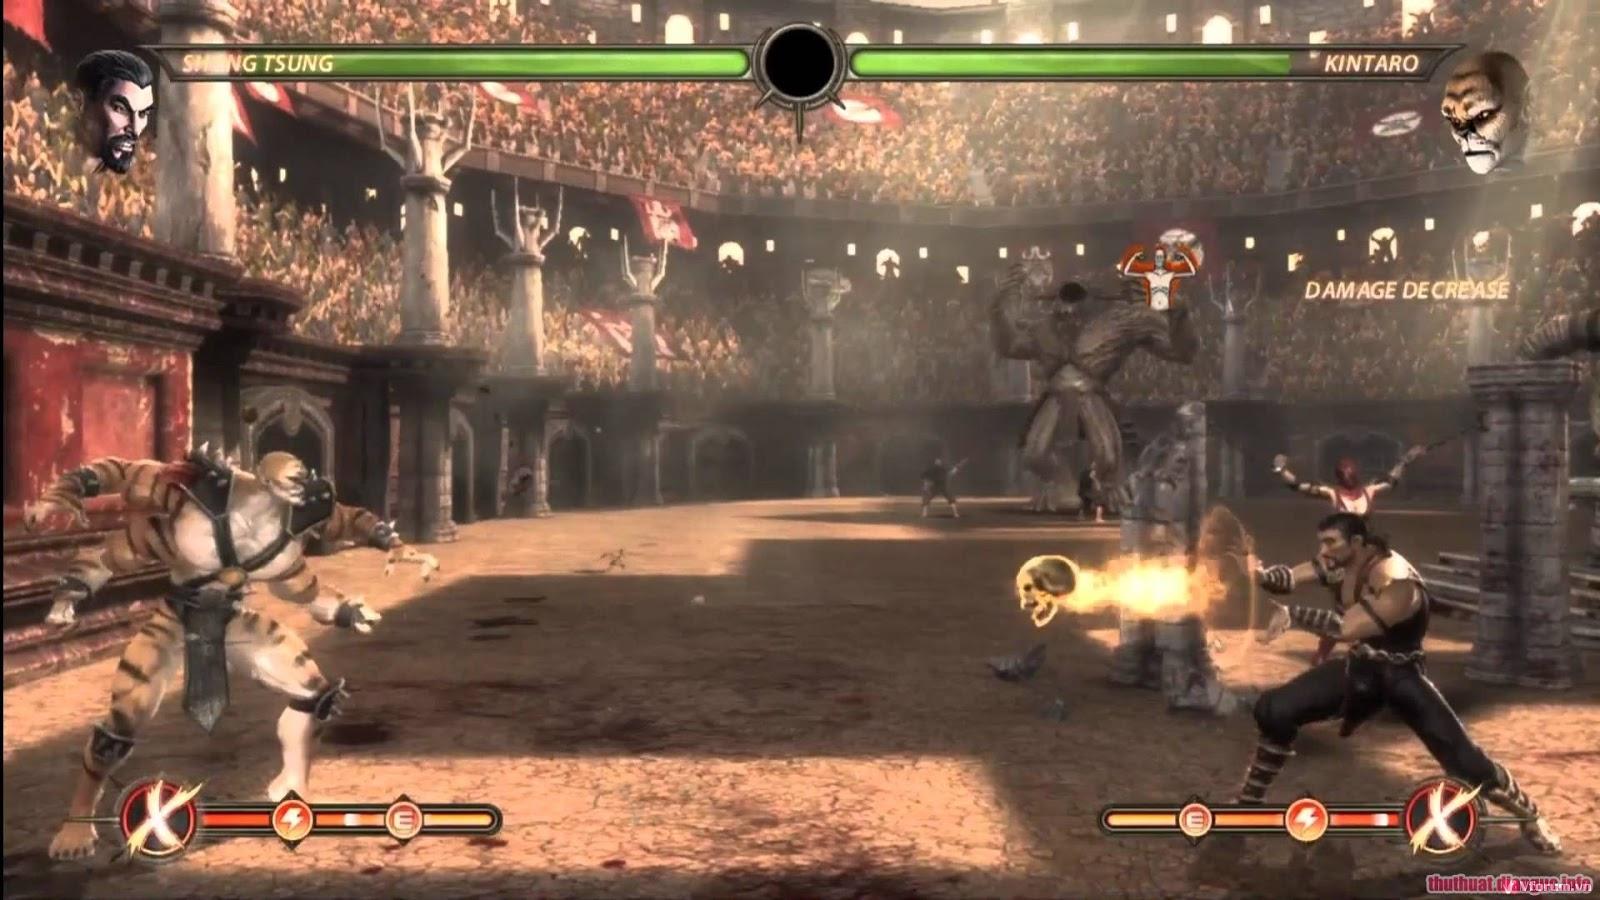 game Mortal Kombat 9 1 linkFshare